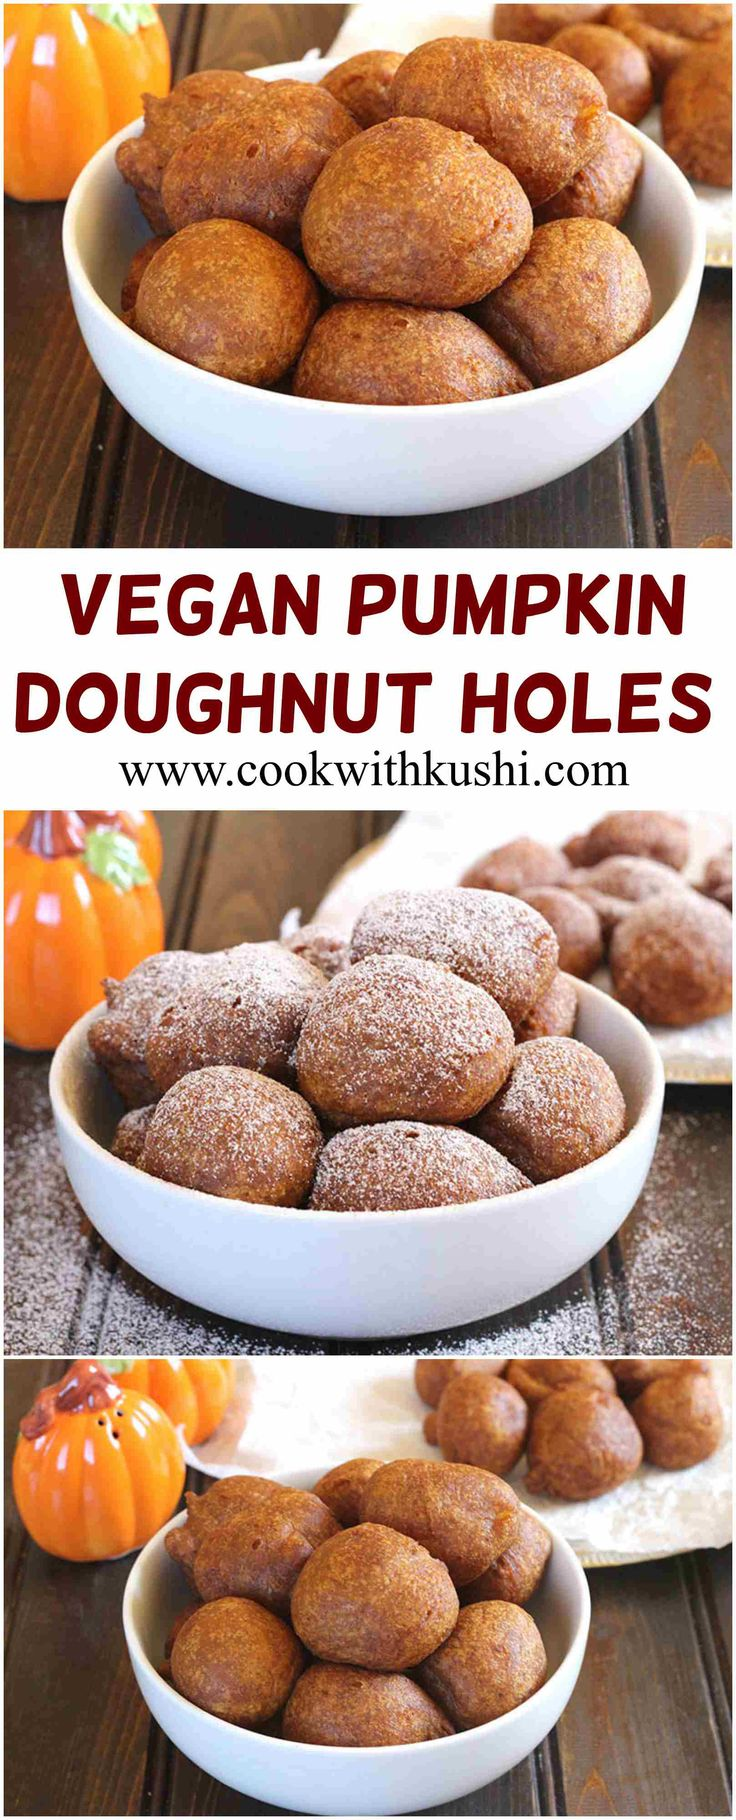 Vegan Pumpkin Doughnut Holes